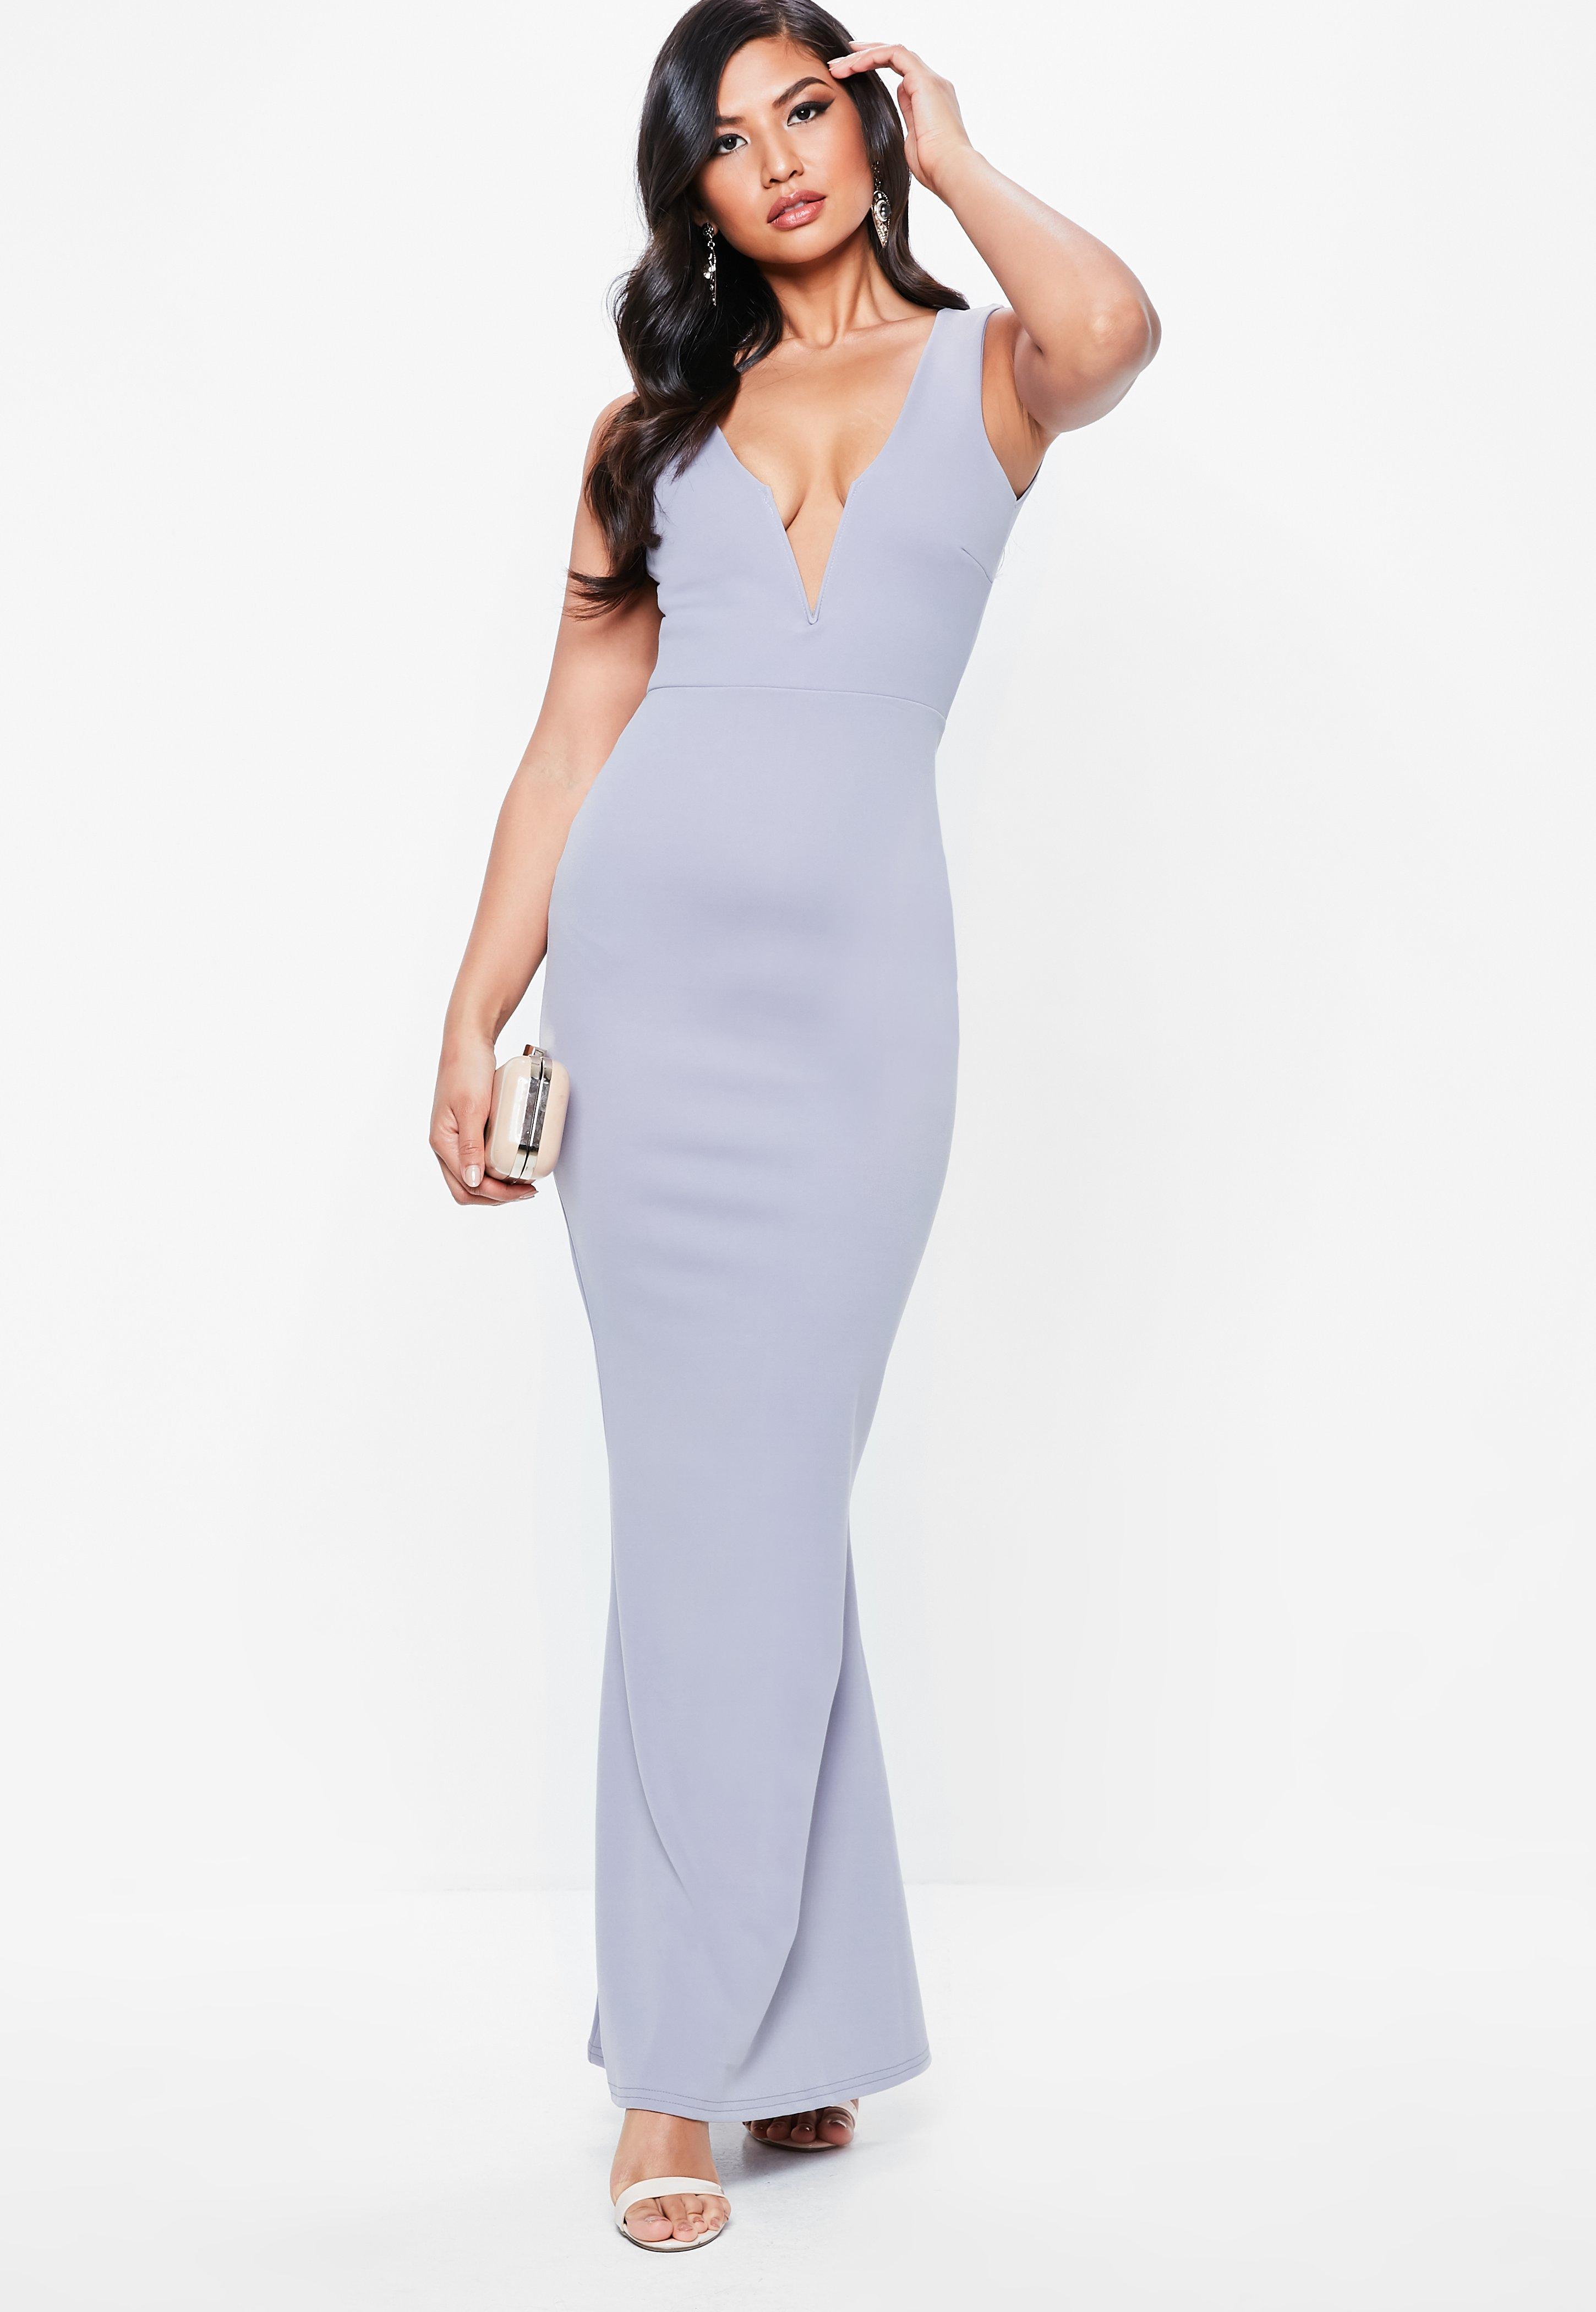 Formal Dresses | Prom Dresses Online - Missguided Australia